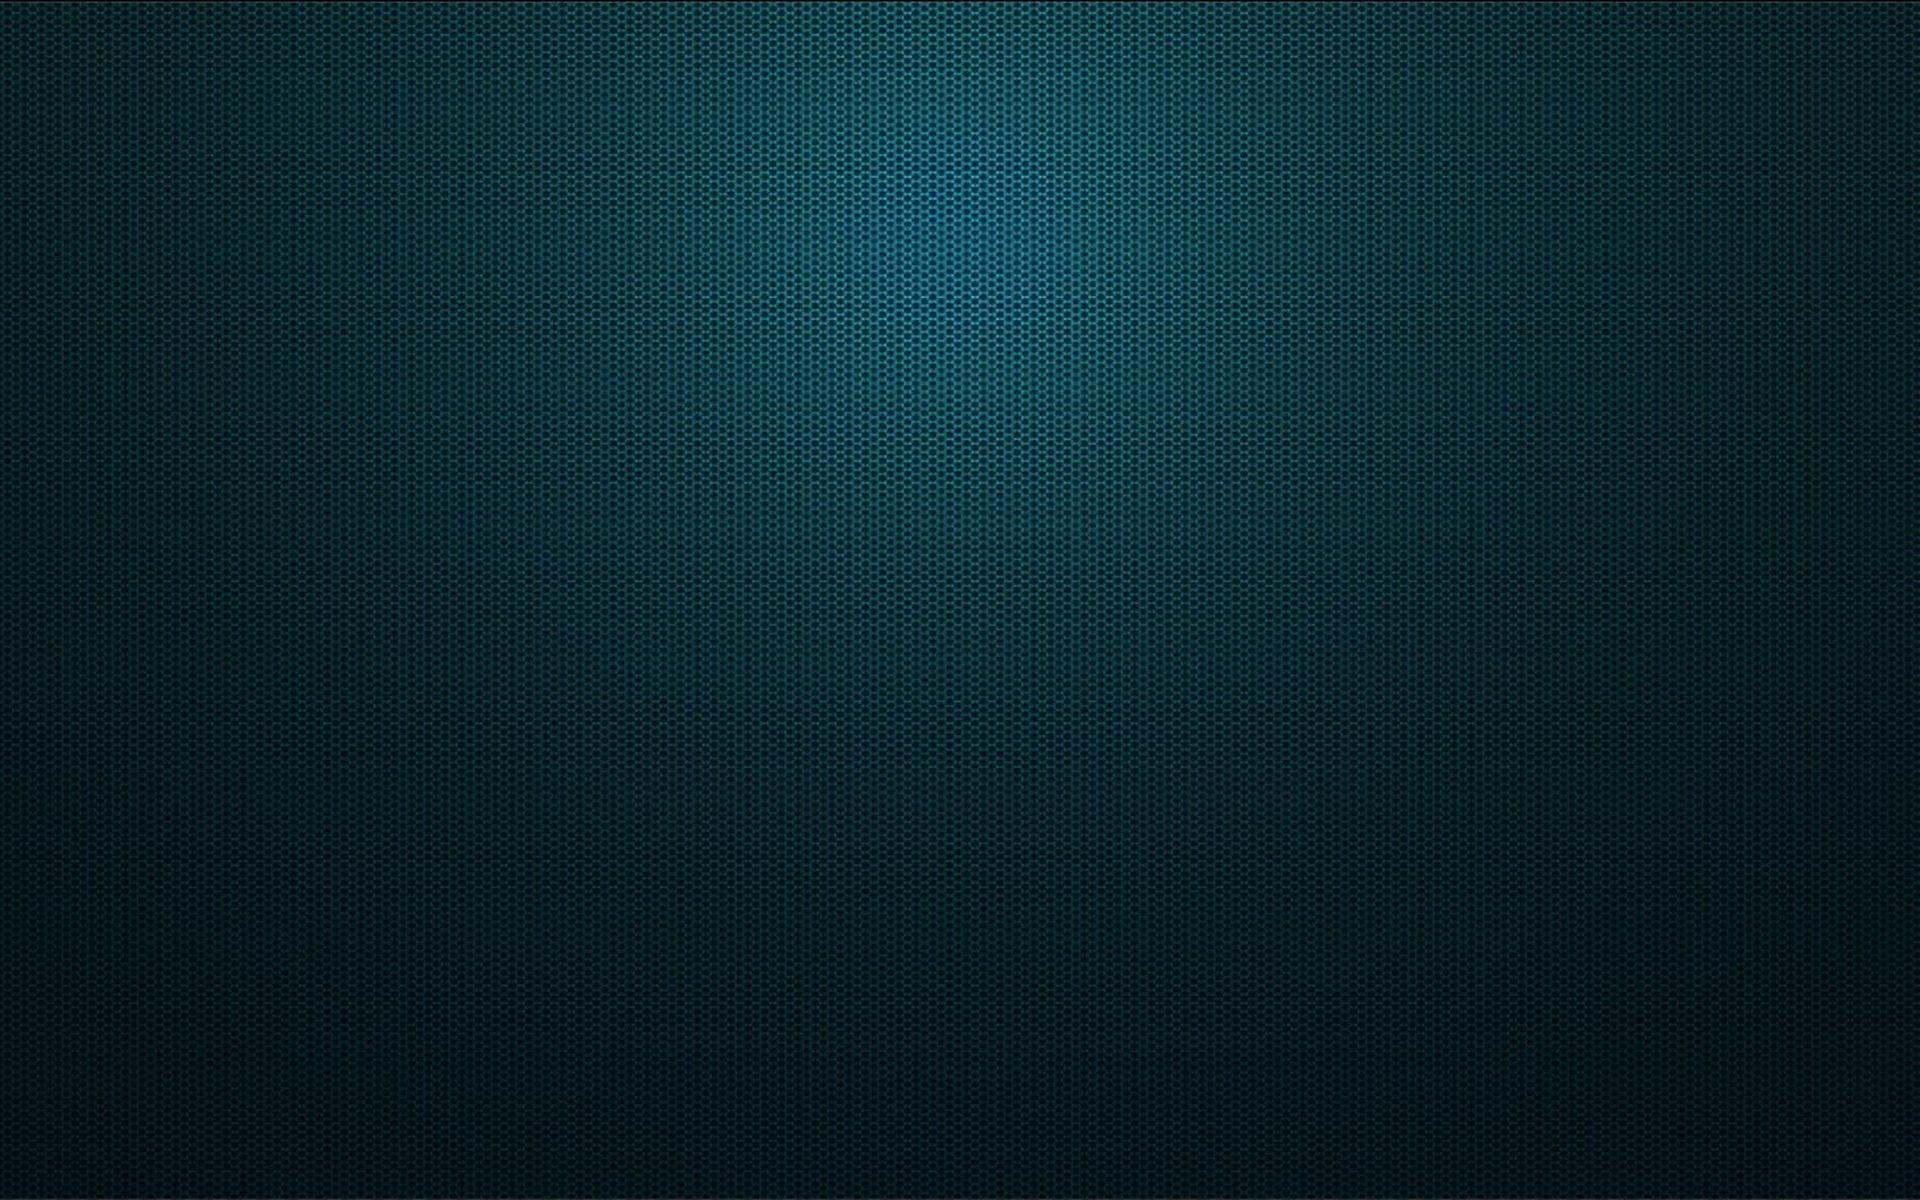 Plaid full hd wallpaper and background 1920x1200 id 375584 for Tartan wallpaper next